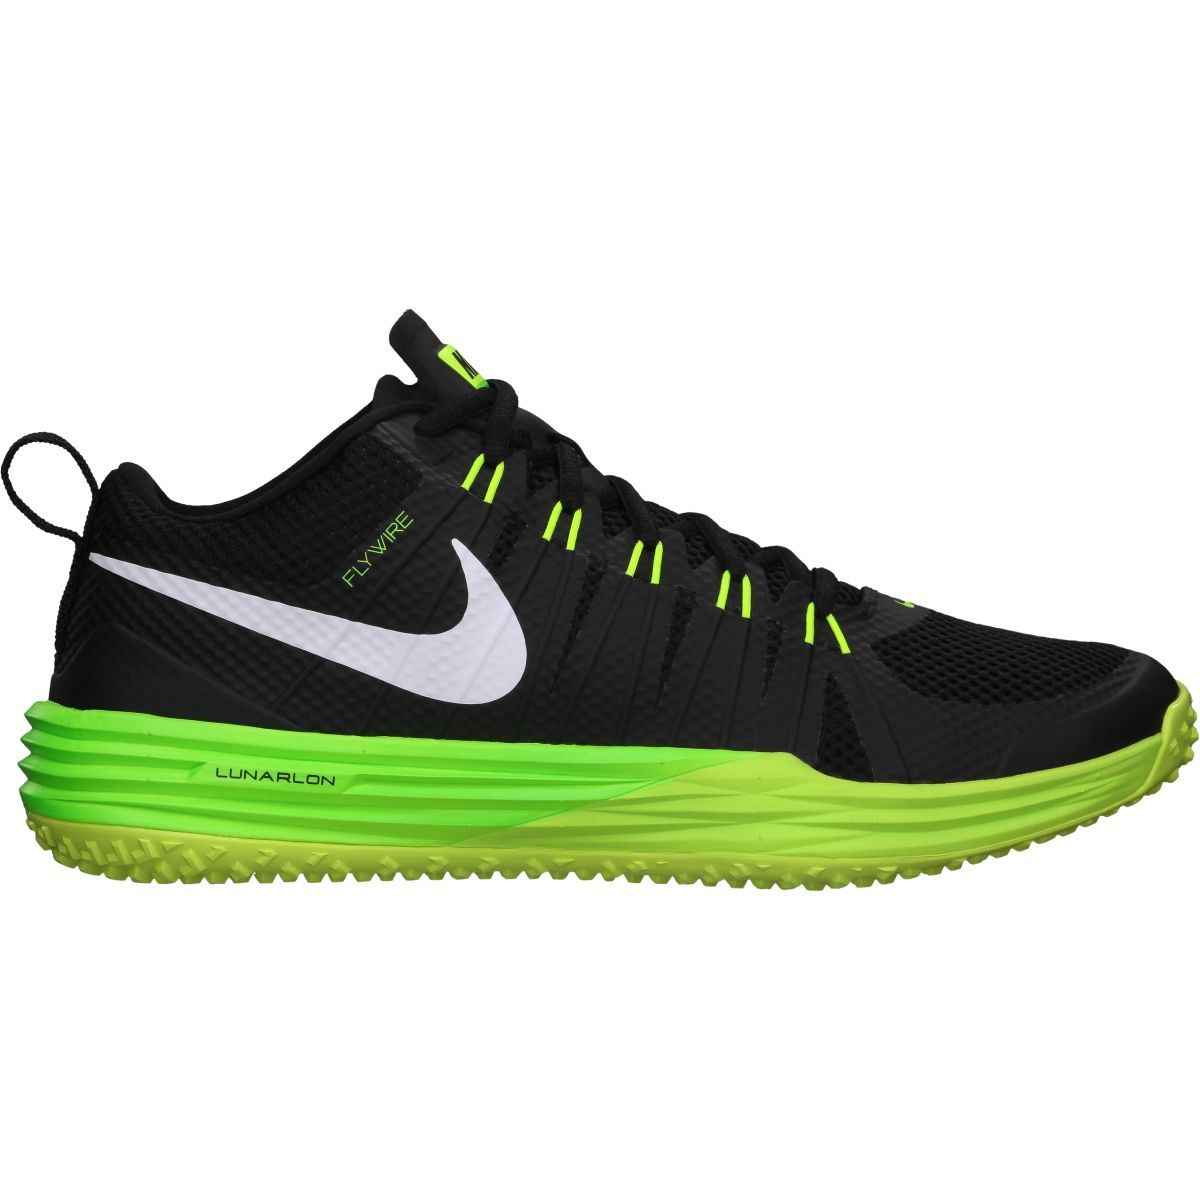 4ea0c3fee5e8 Nike Lunar TR 1 Training Shoes Mens - SportChek.ca